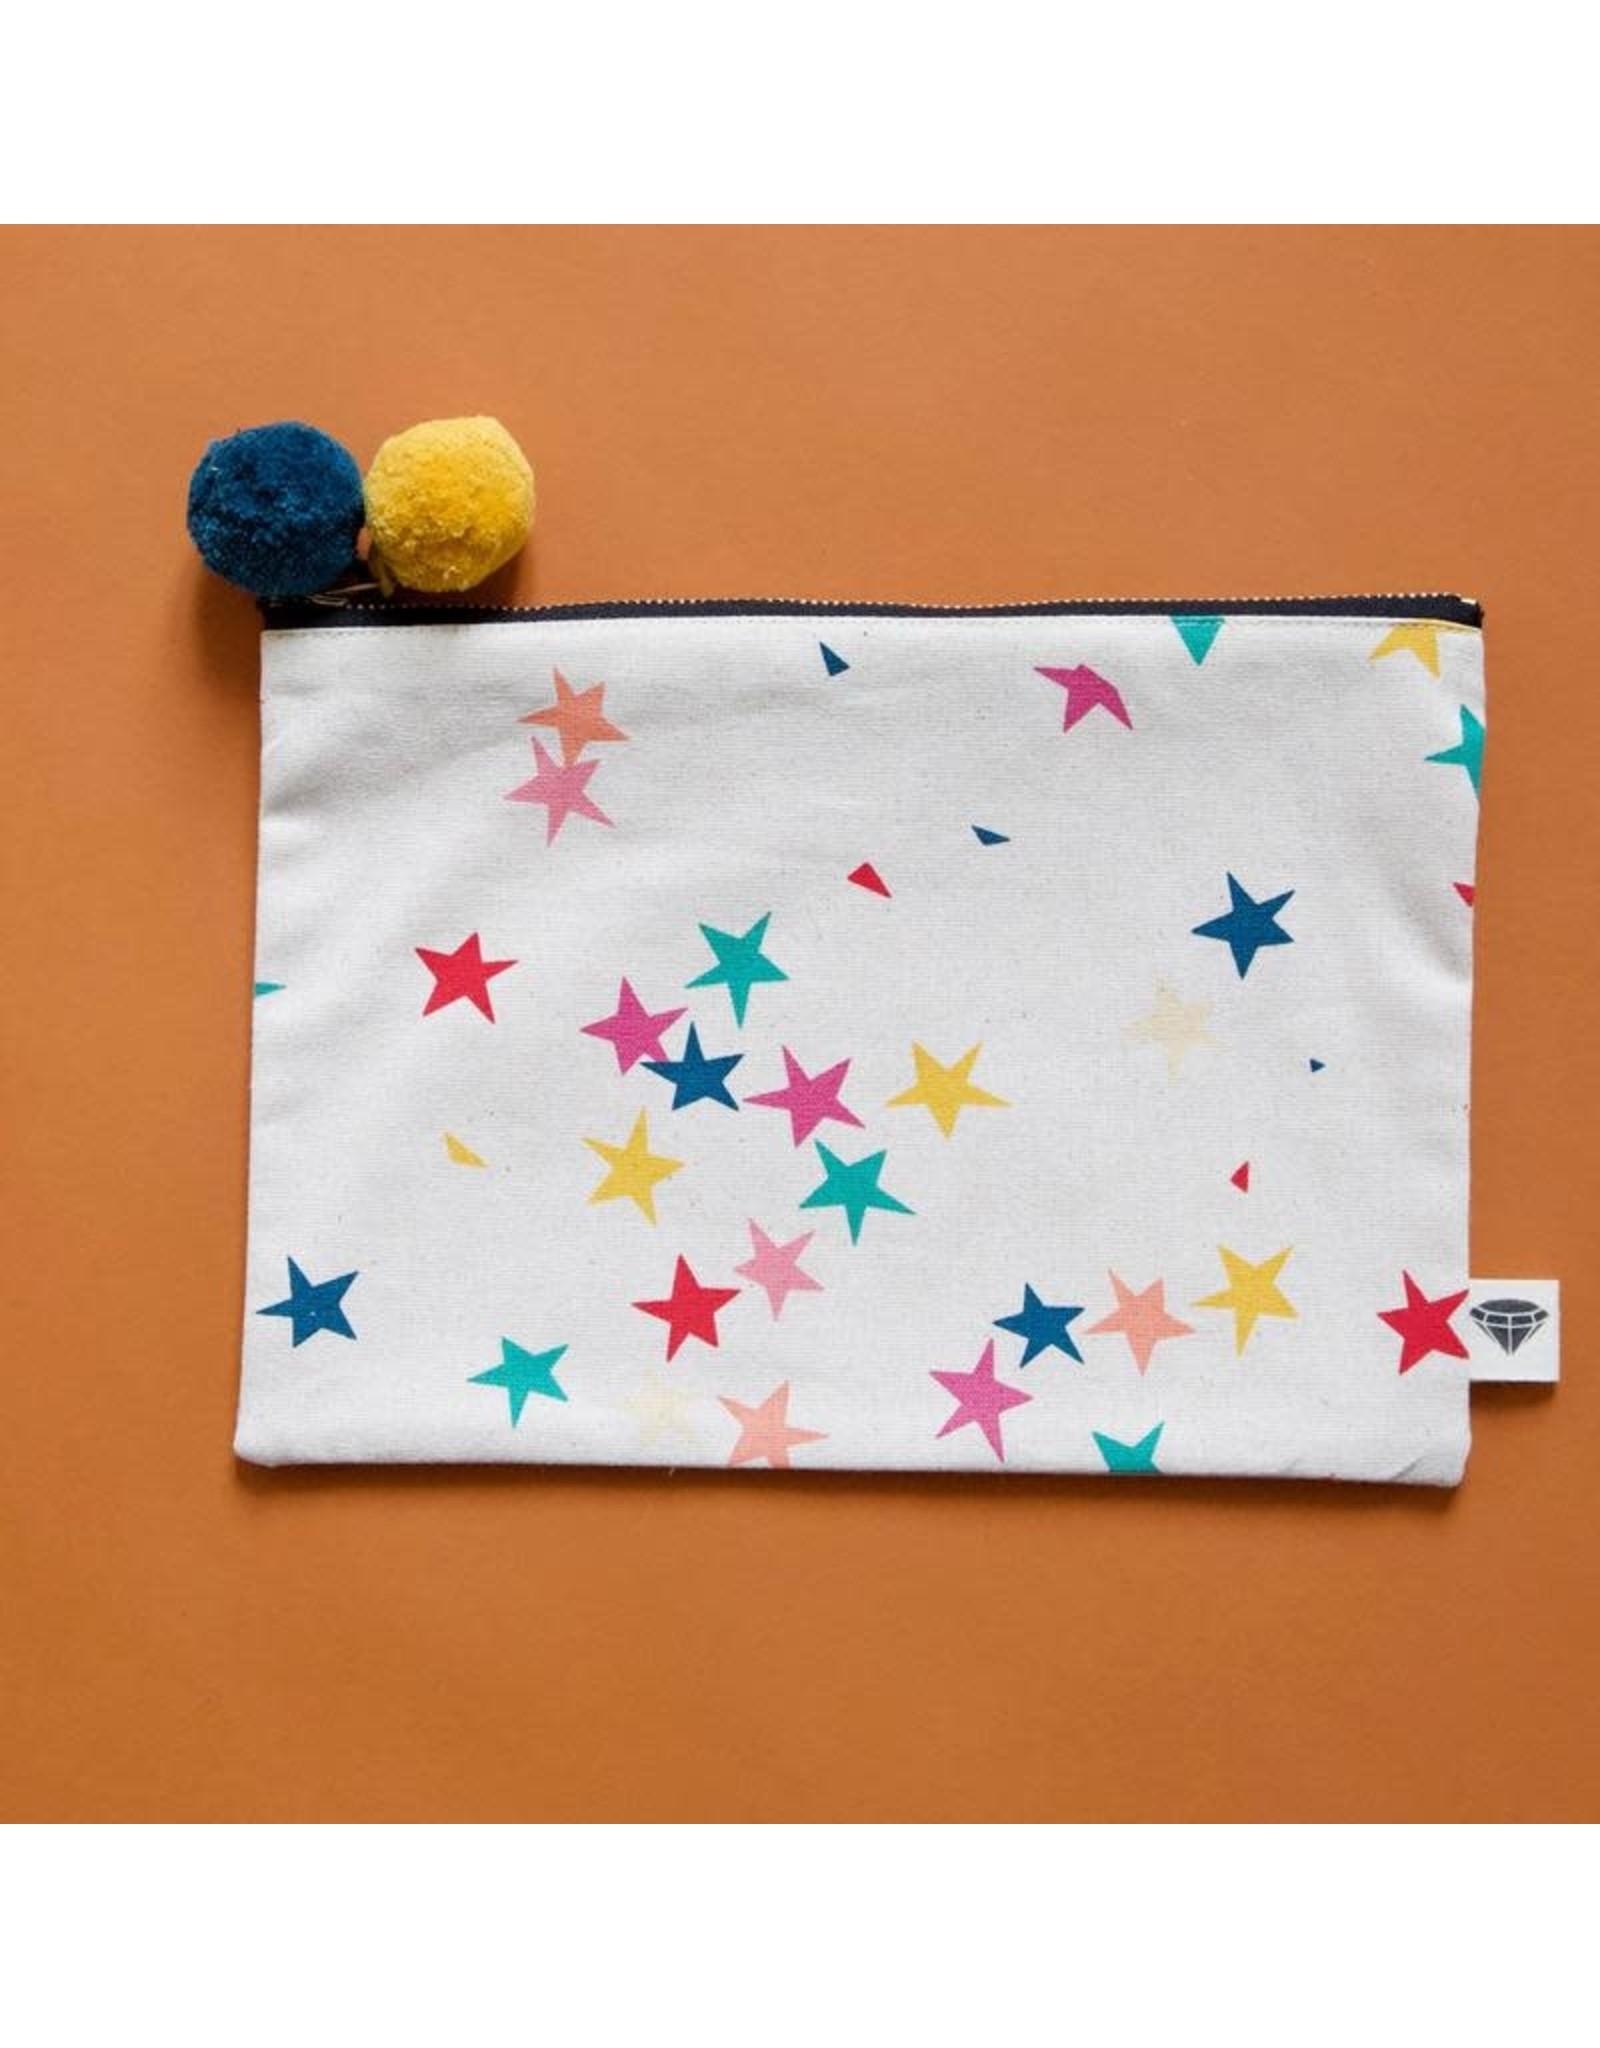 Moda Starfetti Pouch by Rashida Coleman-Hale for Ruby Star Society